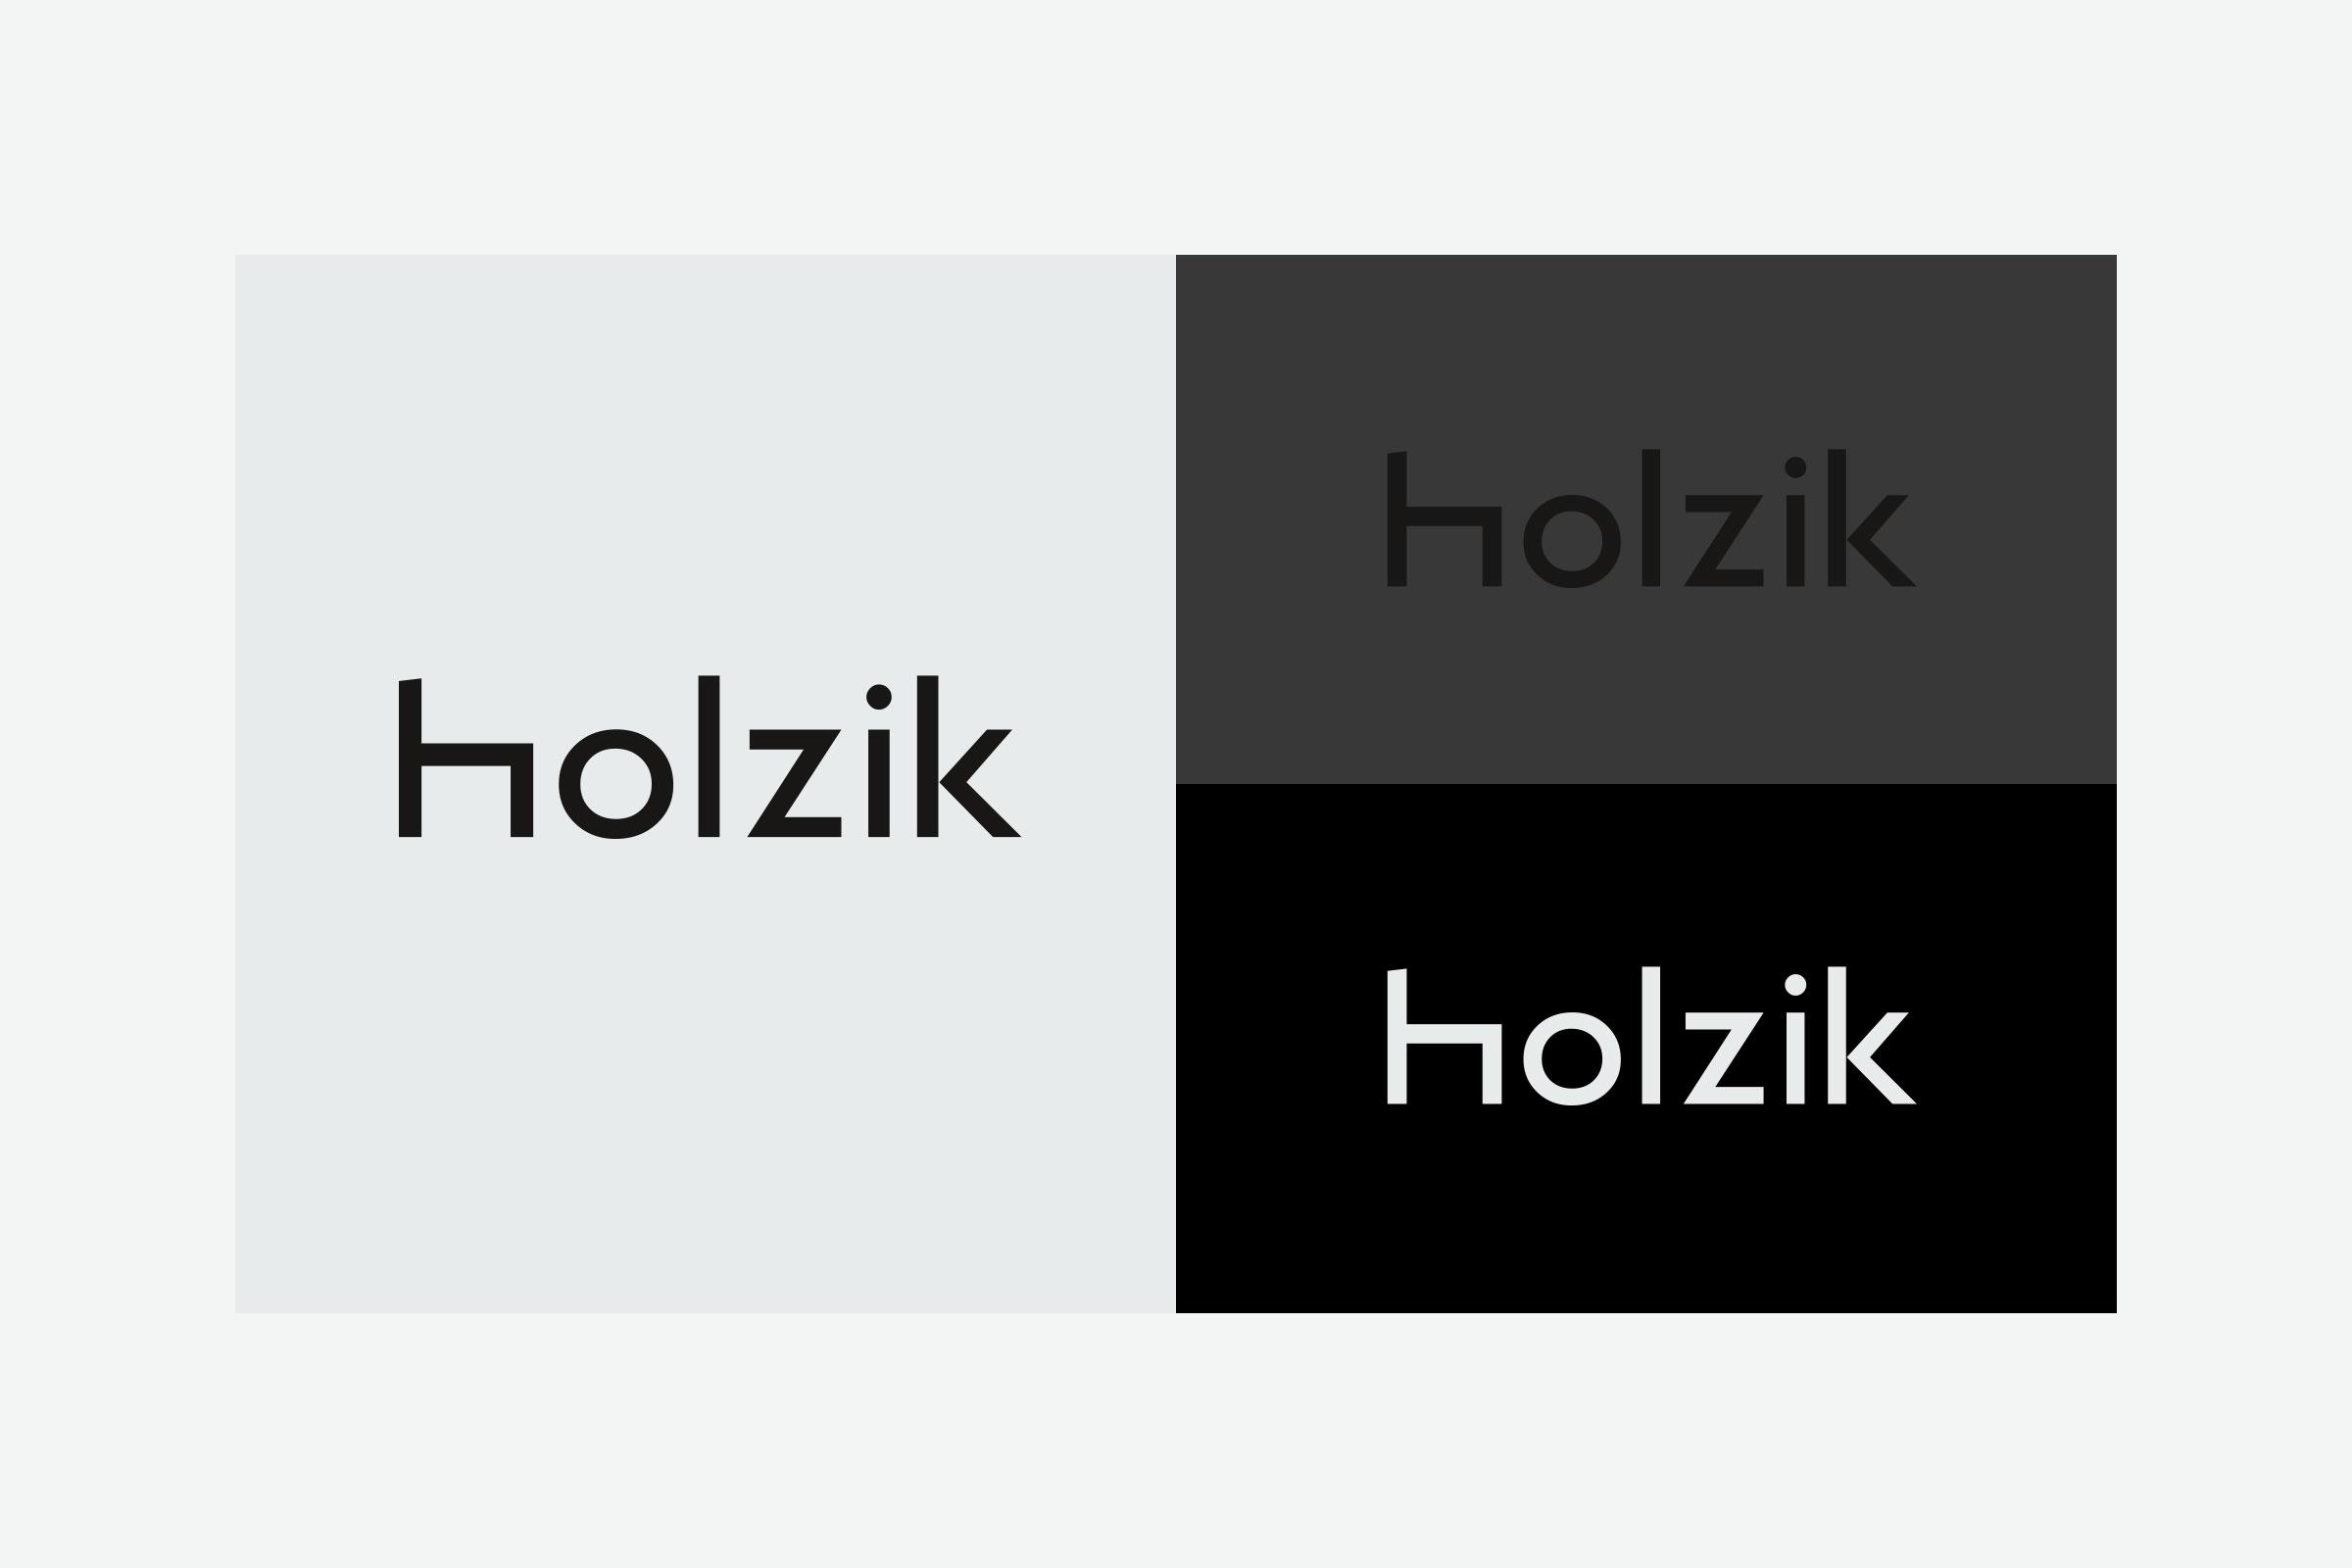 Holzik-2b